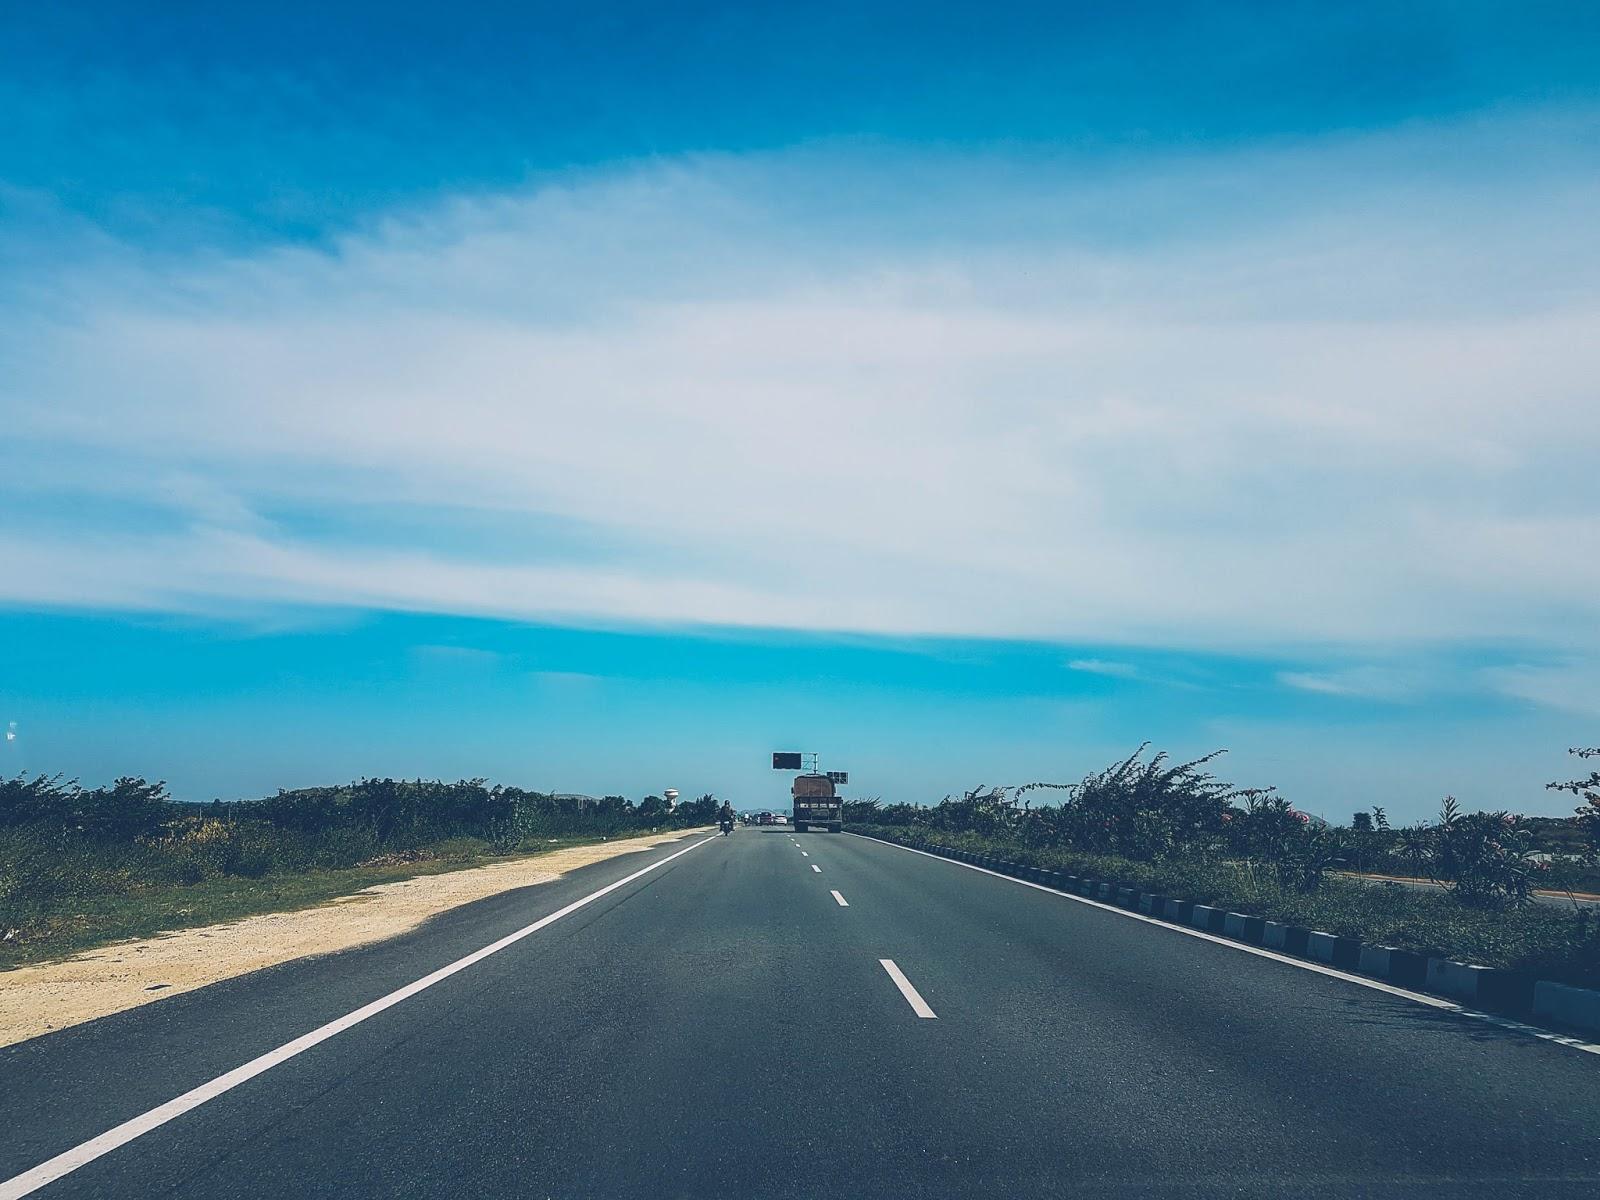 Roadtrip to Gandikota